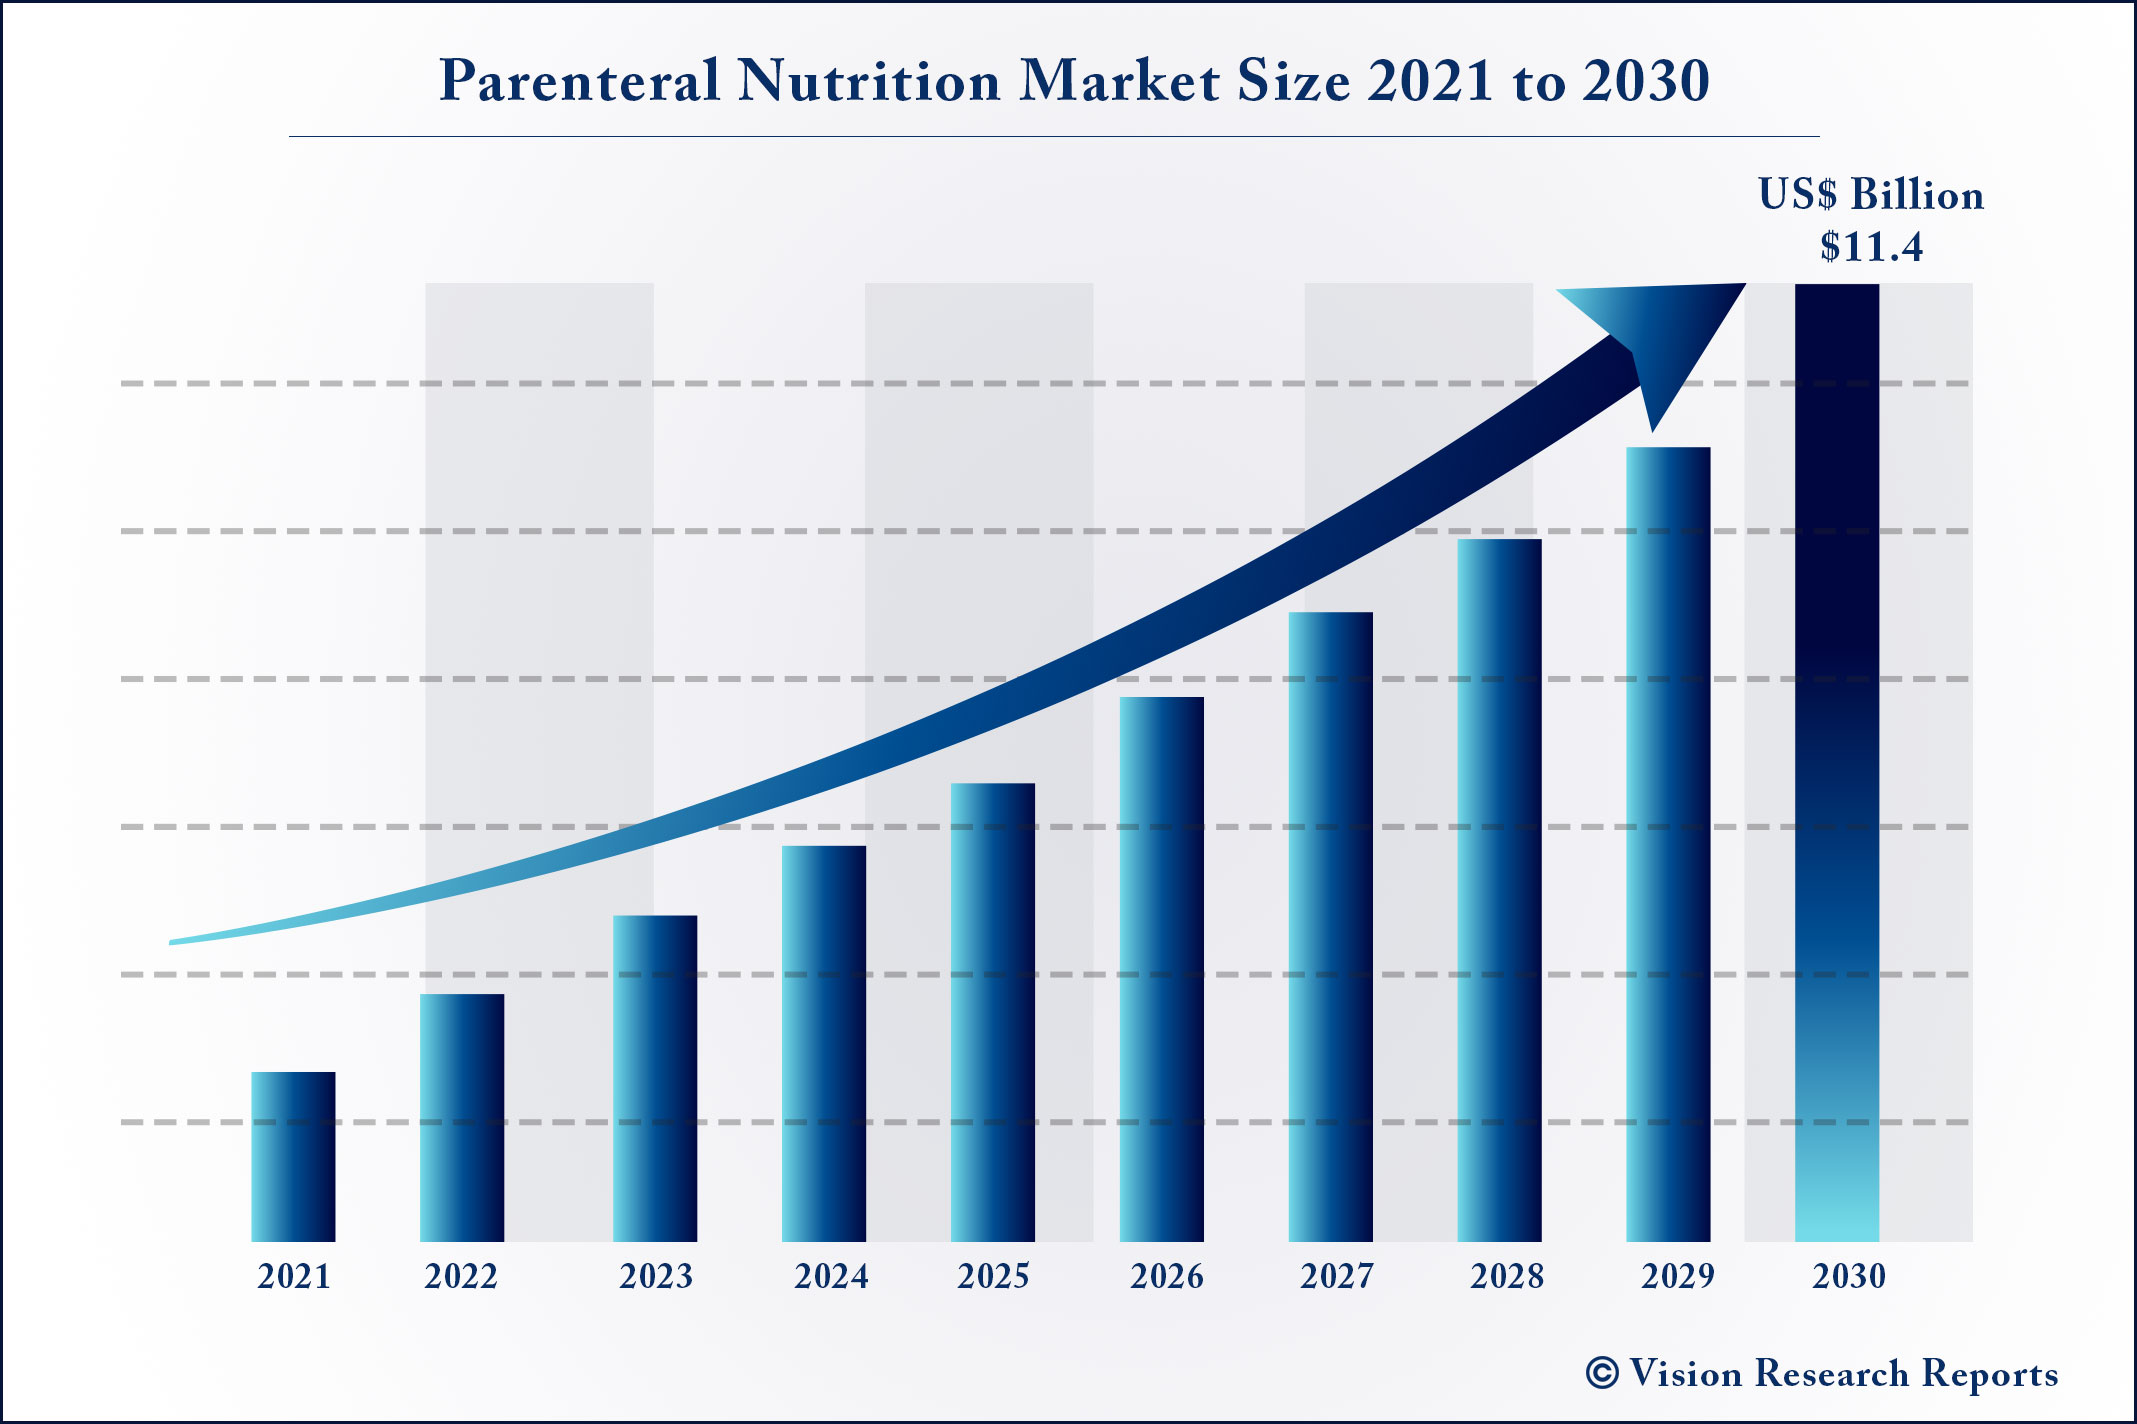 Parenteral Nutrition Market Size 2021 to 2030